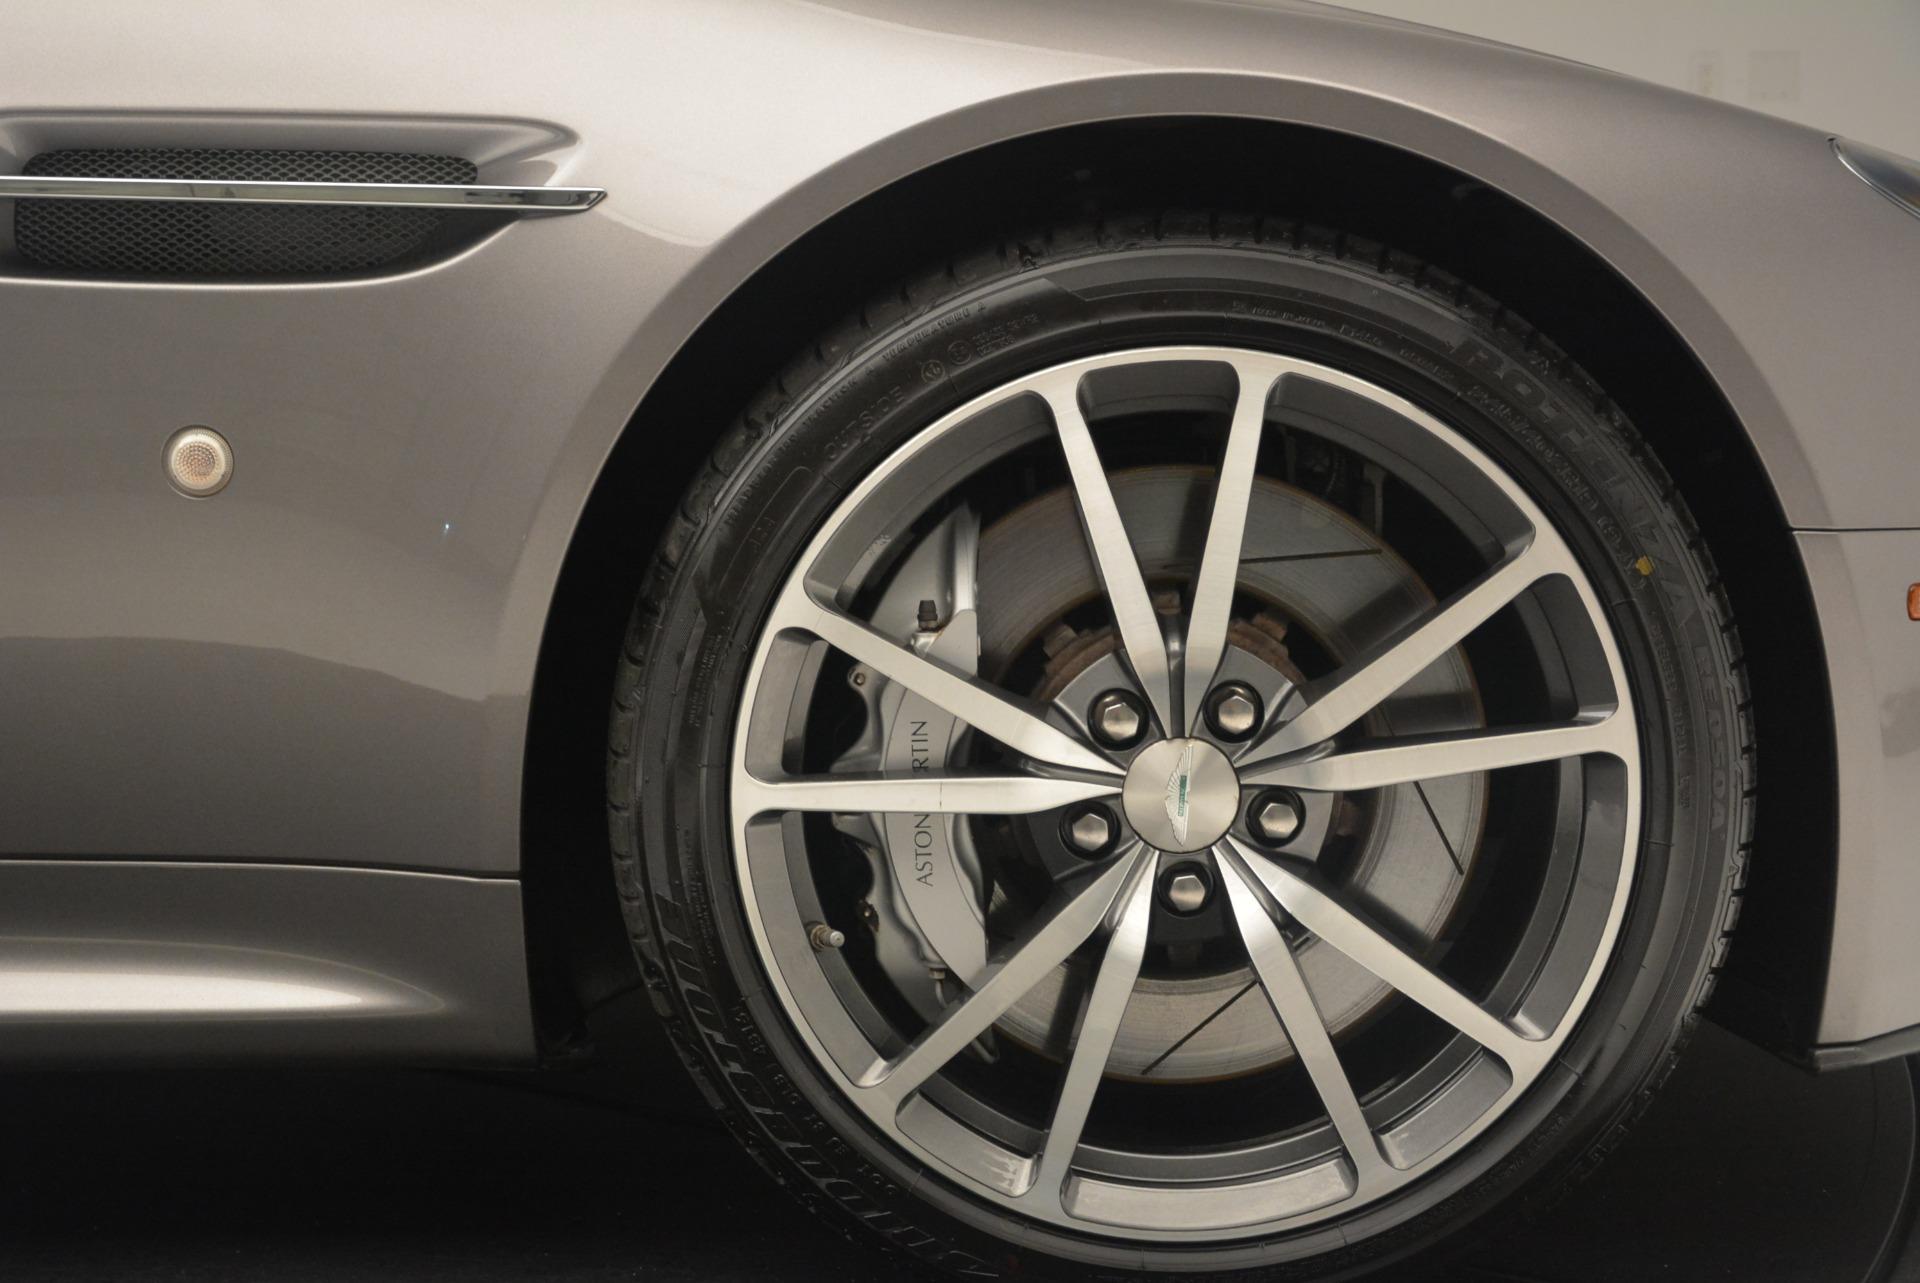 Used 2015 Aston Martin V8 Vantage Roadster For Sale In Westport, CT 2463_p24